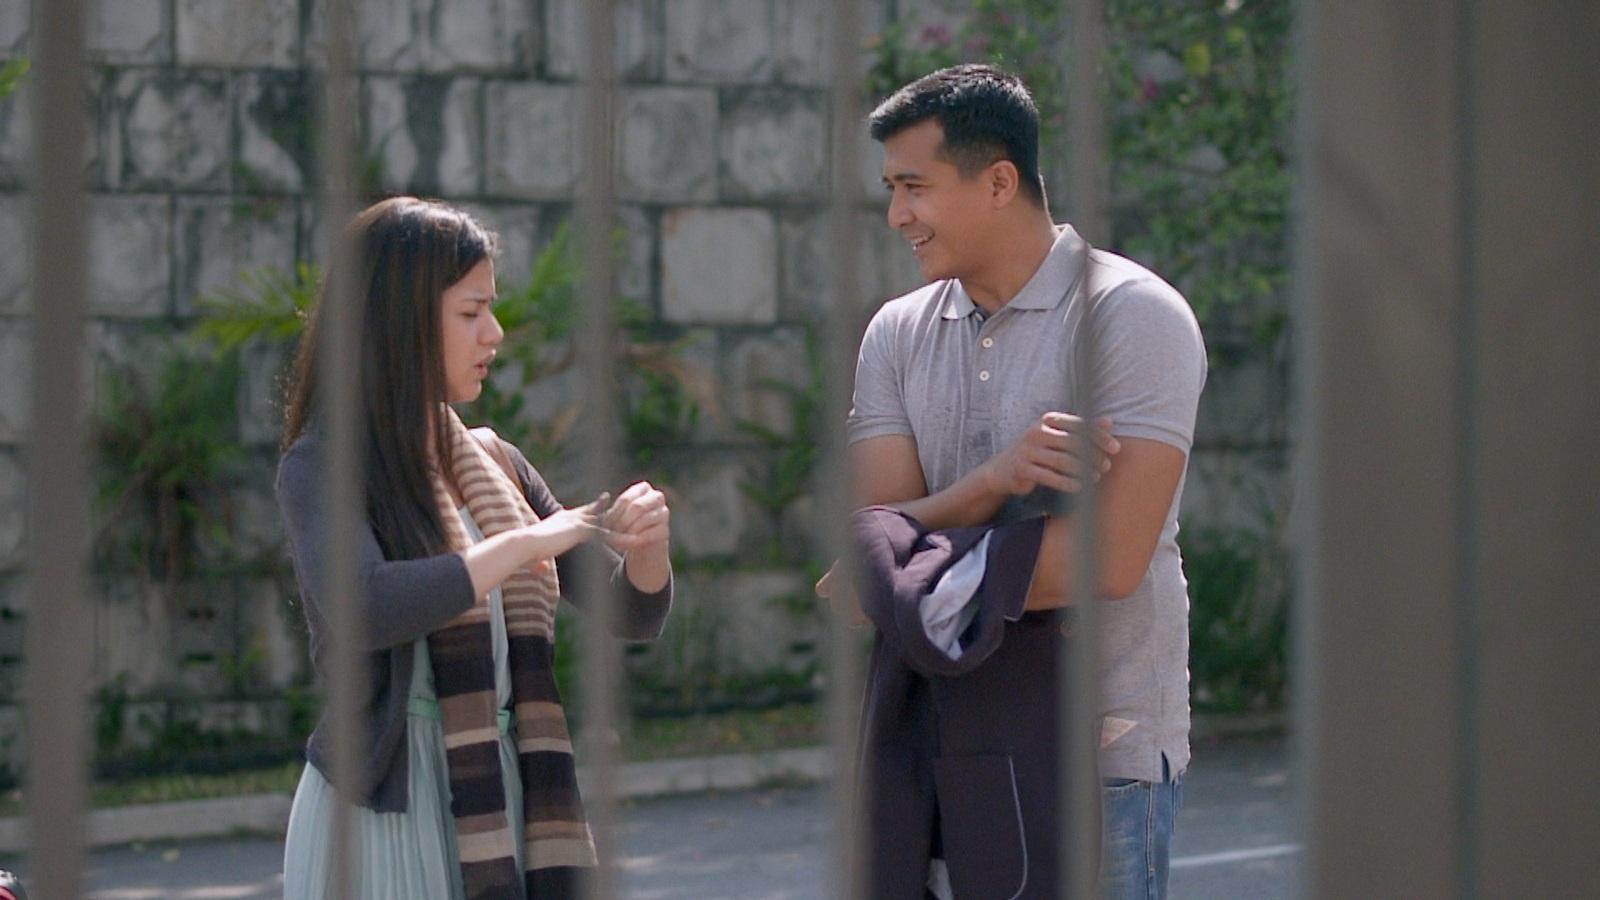 Sinopsis Suamiku Encik Perfect 10 Lakonan Lisa Surihani